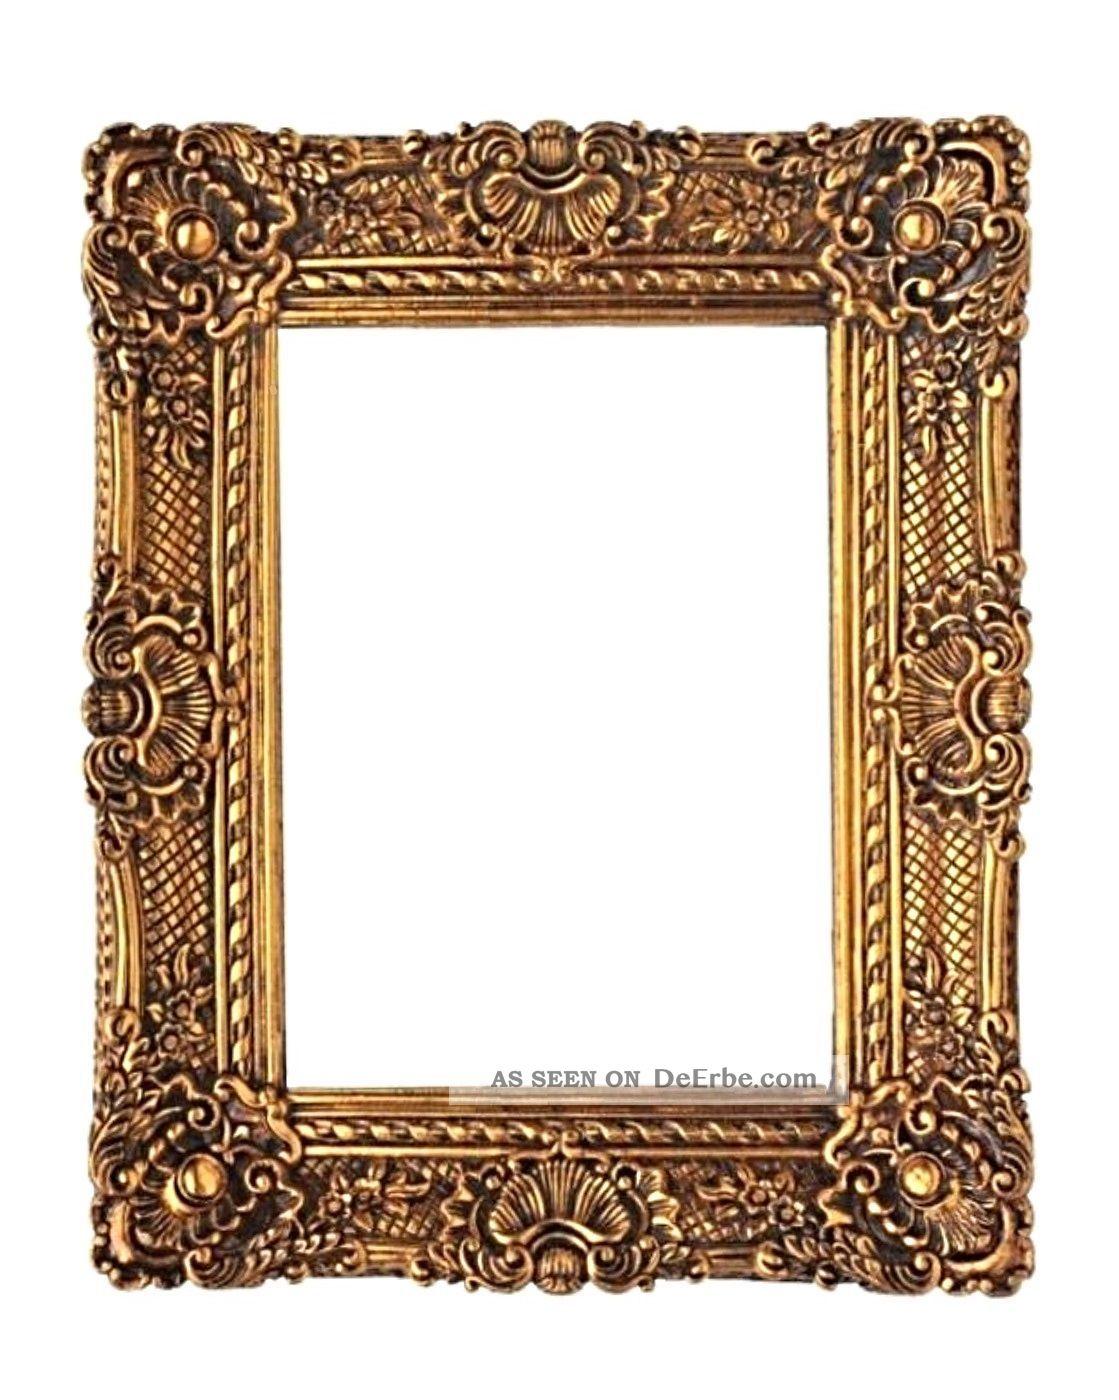 barockrahmen 60 x 50 cm gem lde prunkrahmen gold bilderrahmen mit aufh nger. Black Bedroom Furniture Sets. Home Design Ideas